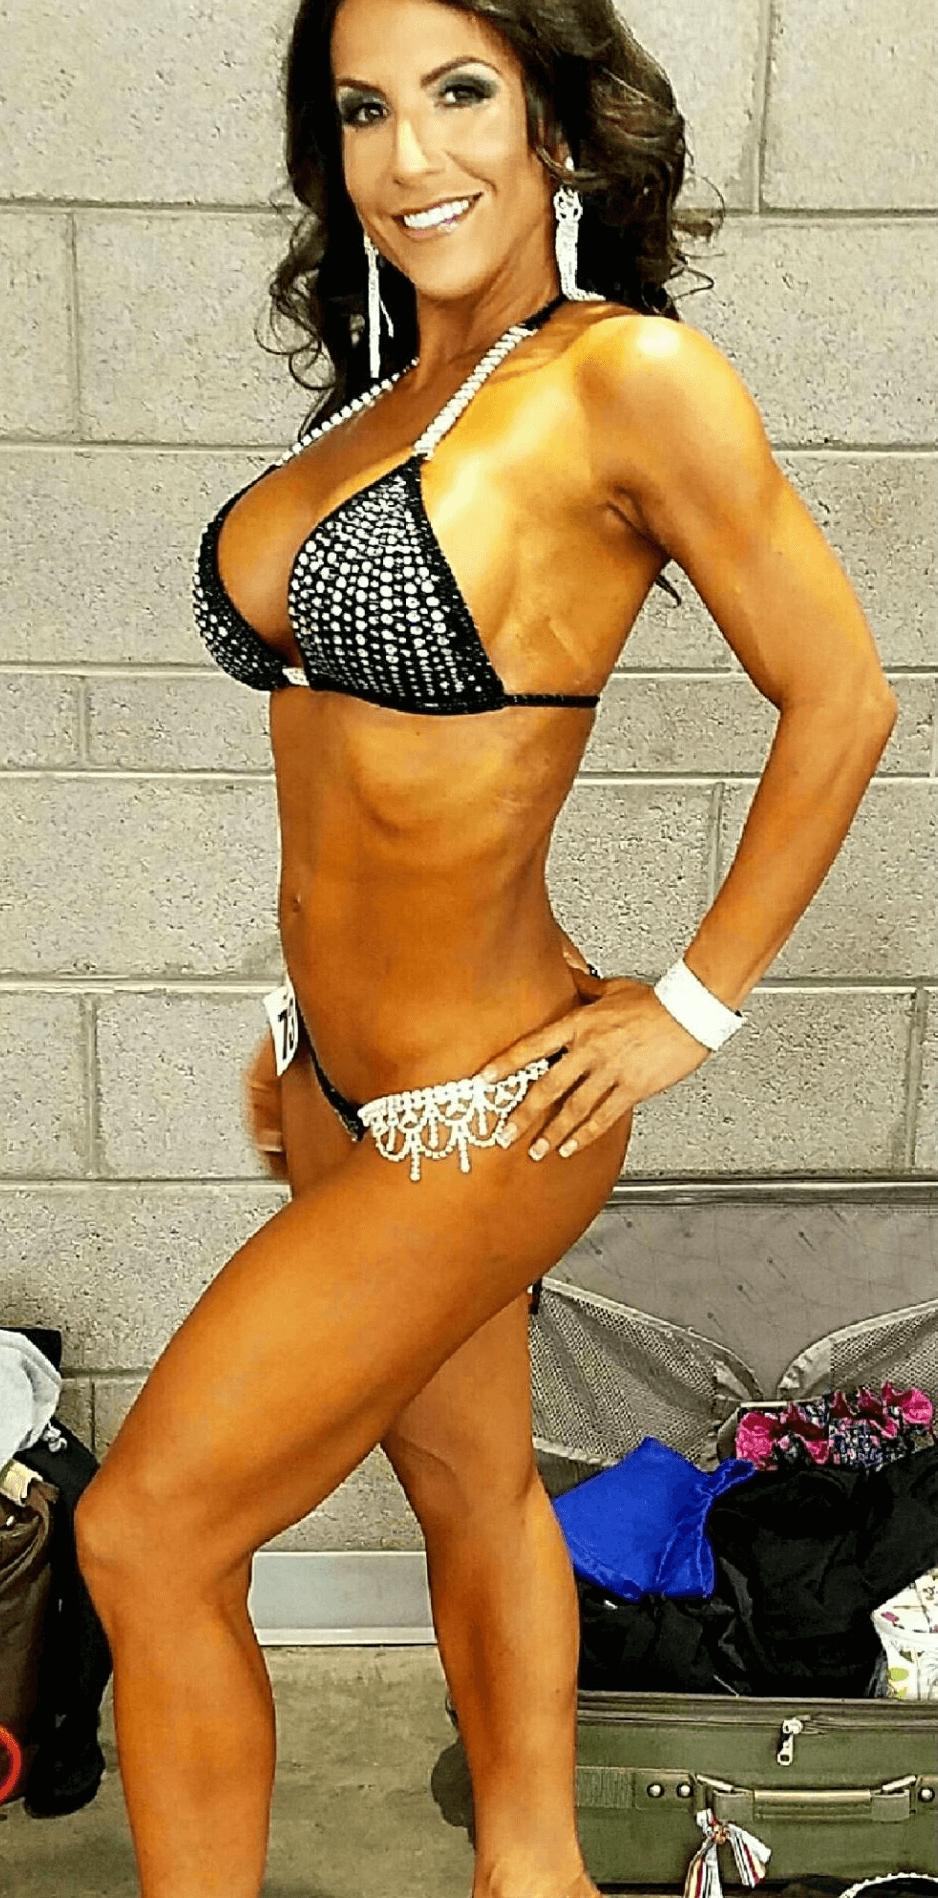 Tricia Zacchini After Karen Mullarkey Training